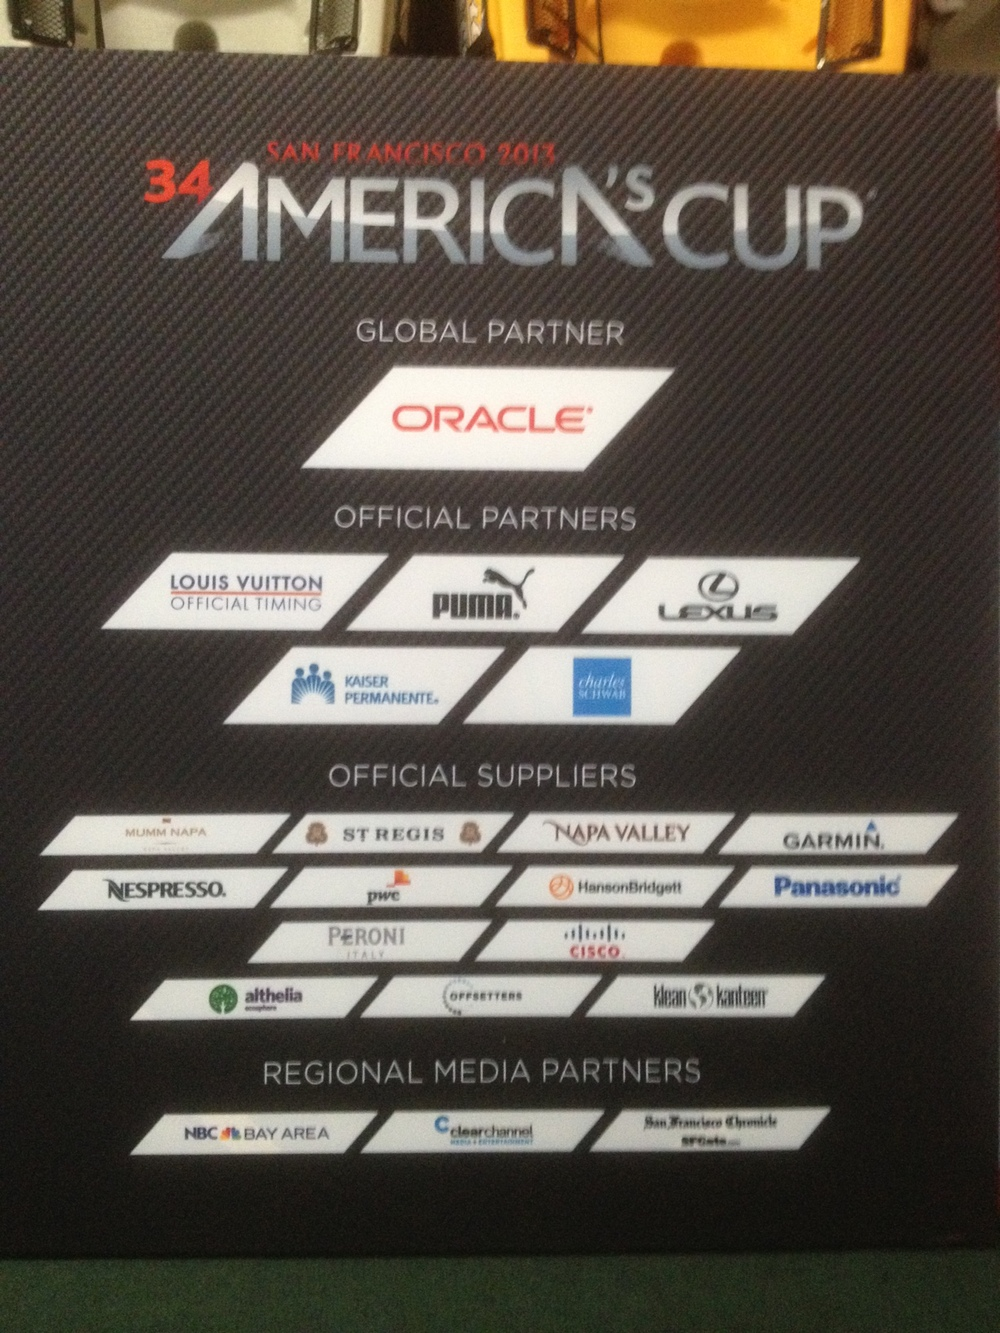 America's Cup Sponsors (4 foot x 3 1/2 foot)  $ 200